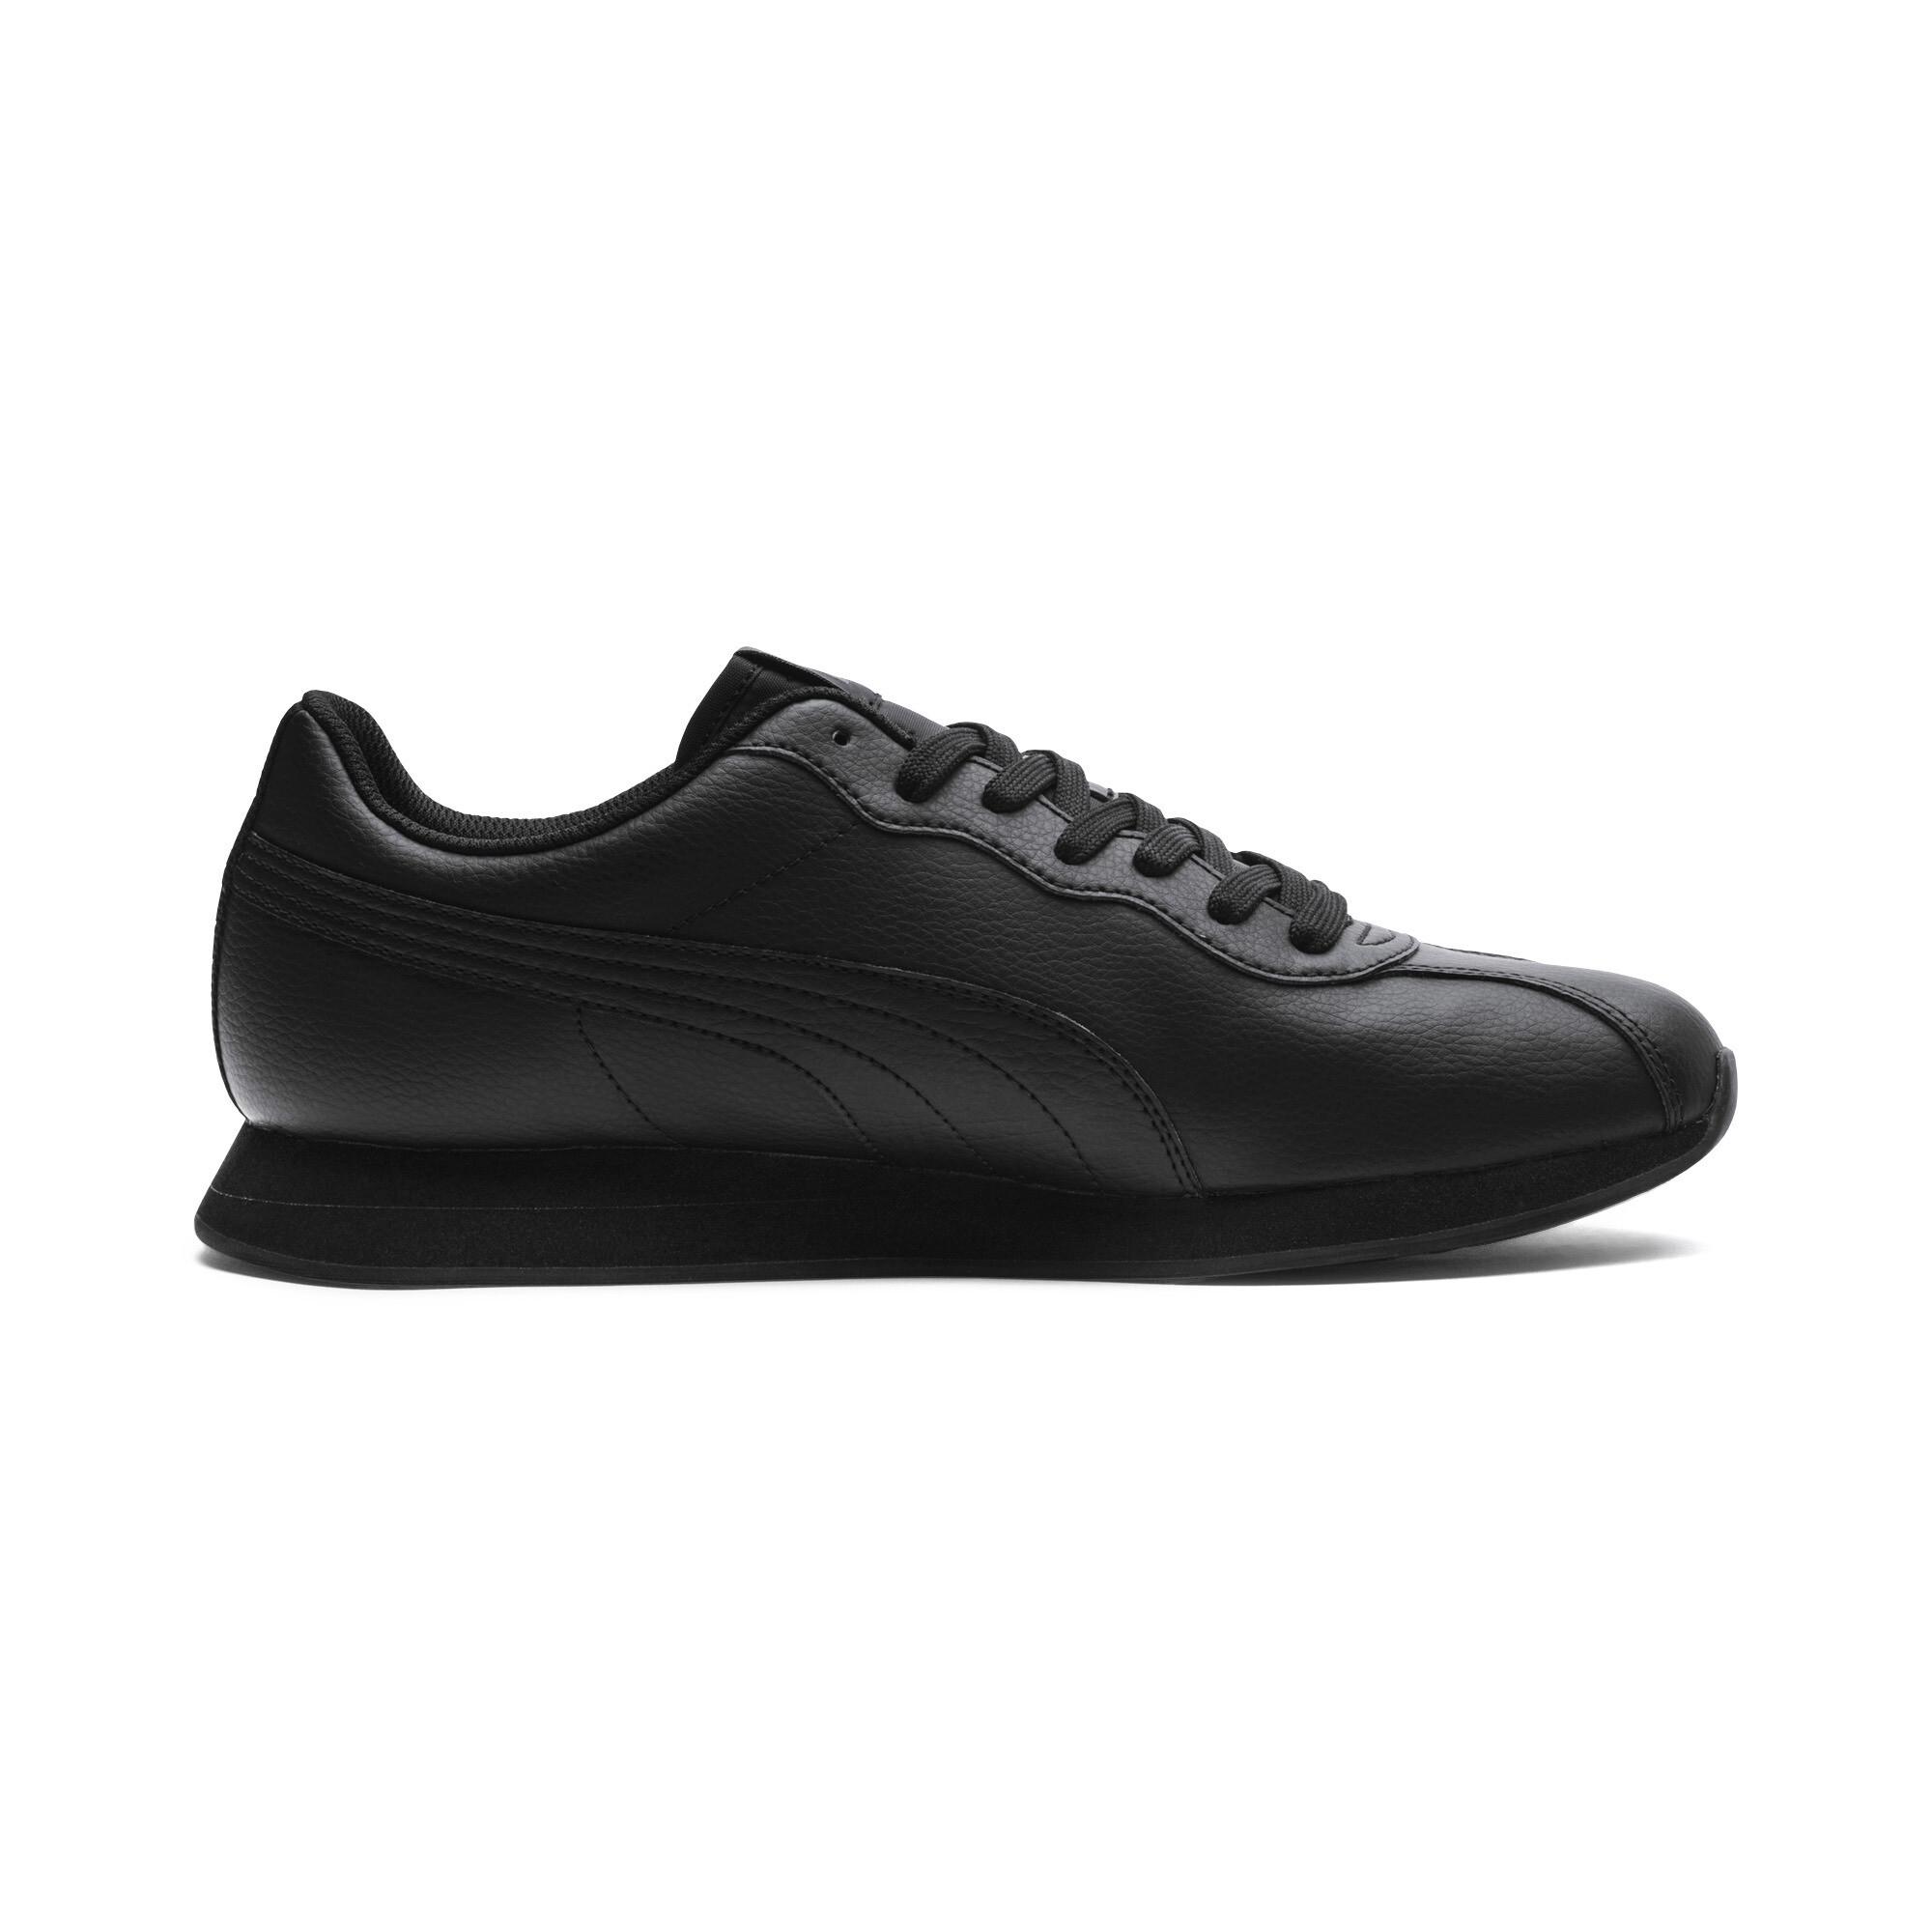 PUMA-Men-039-s-Turin-II-Sneakers thumbnail 6